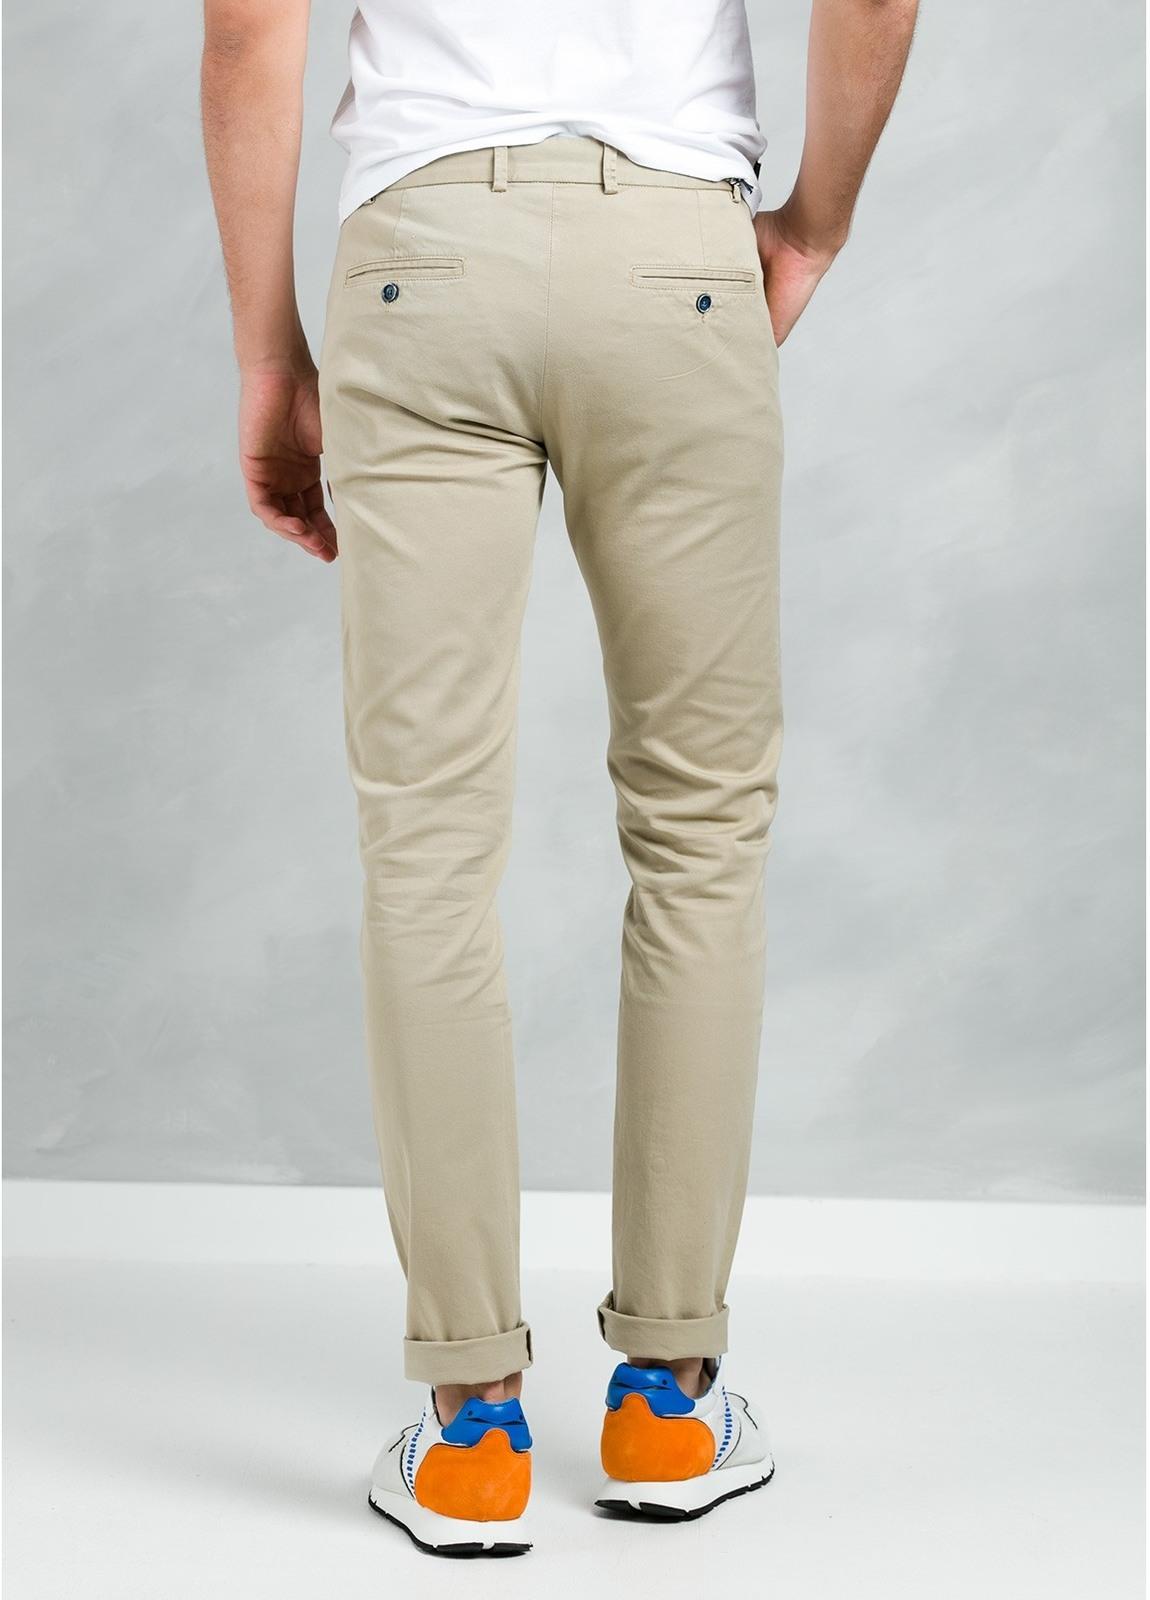 Pantalón Casual Wear, SLIM FIT micro textura color beige, 97% Algodón 3% Elastómero. - Ítem3